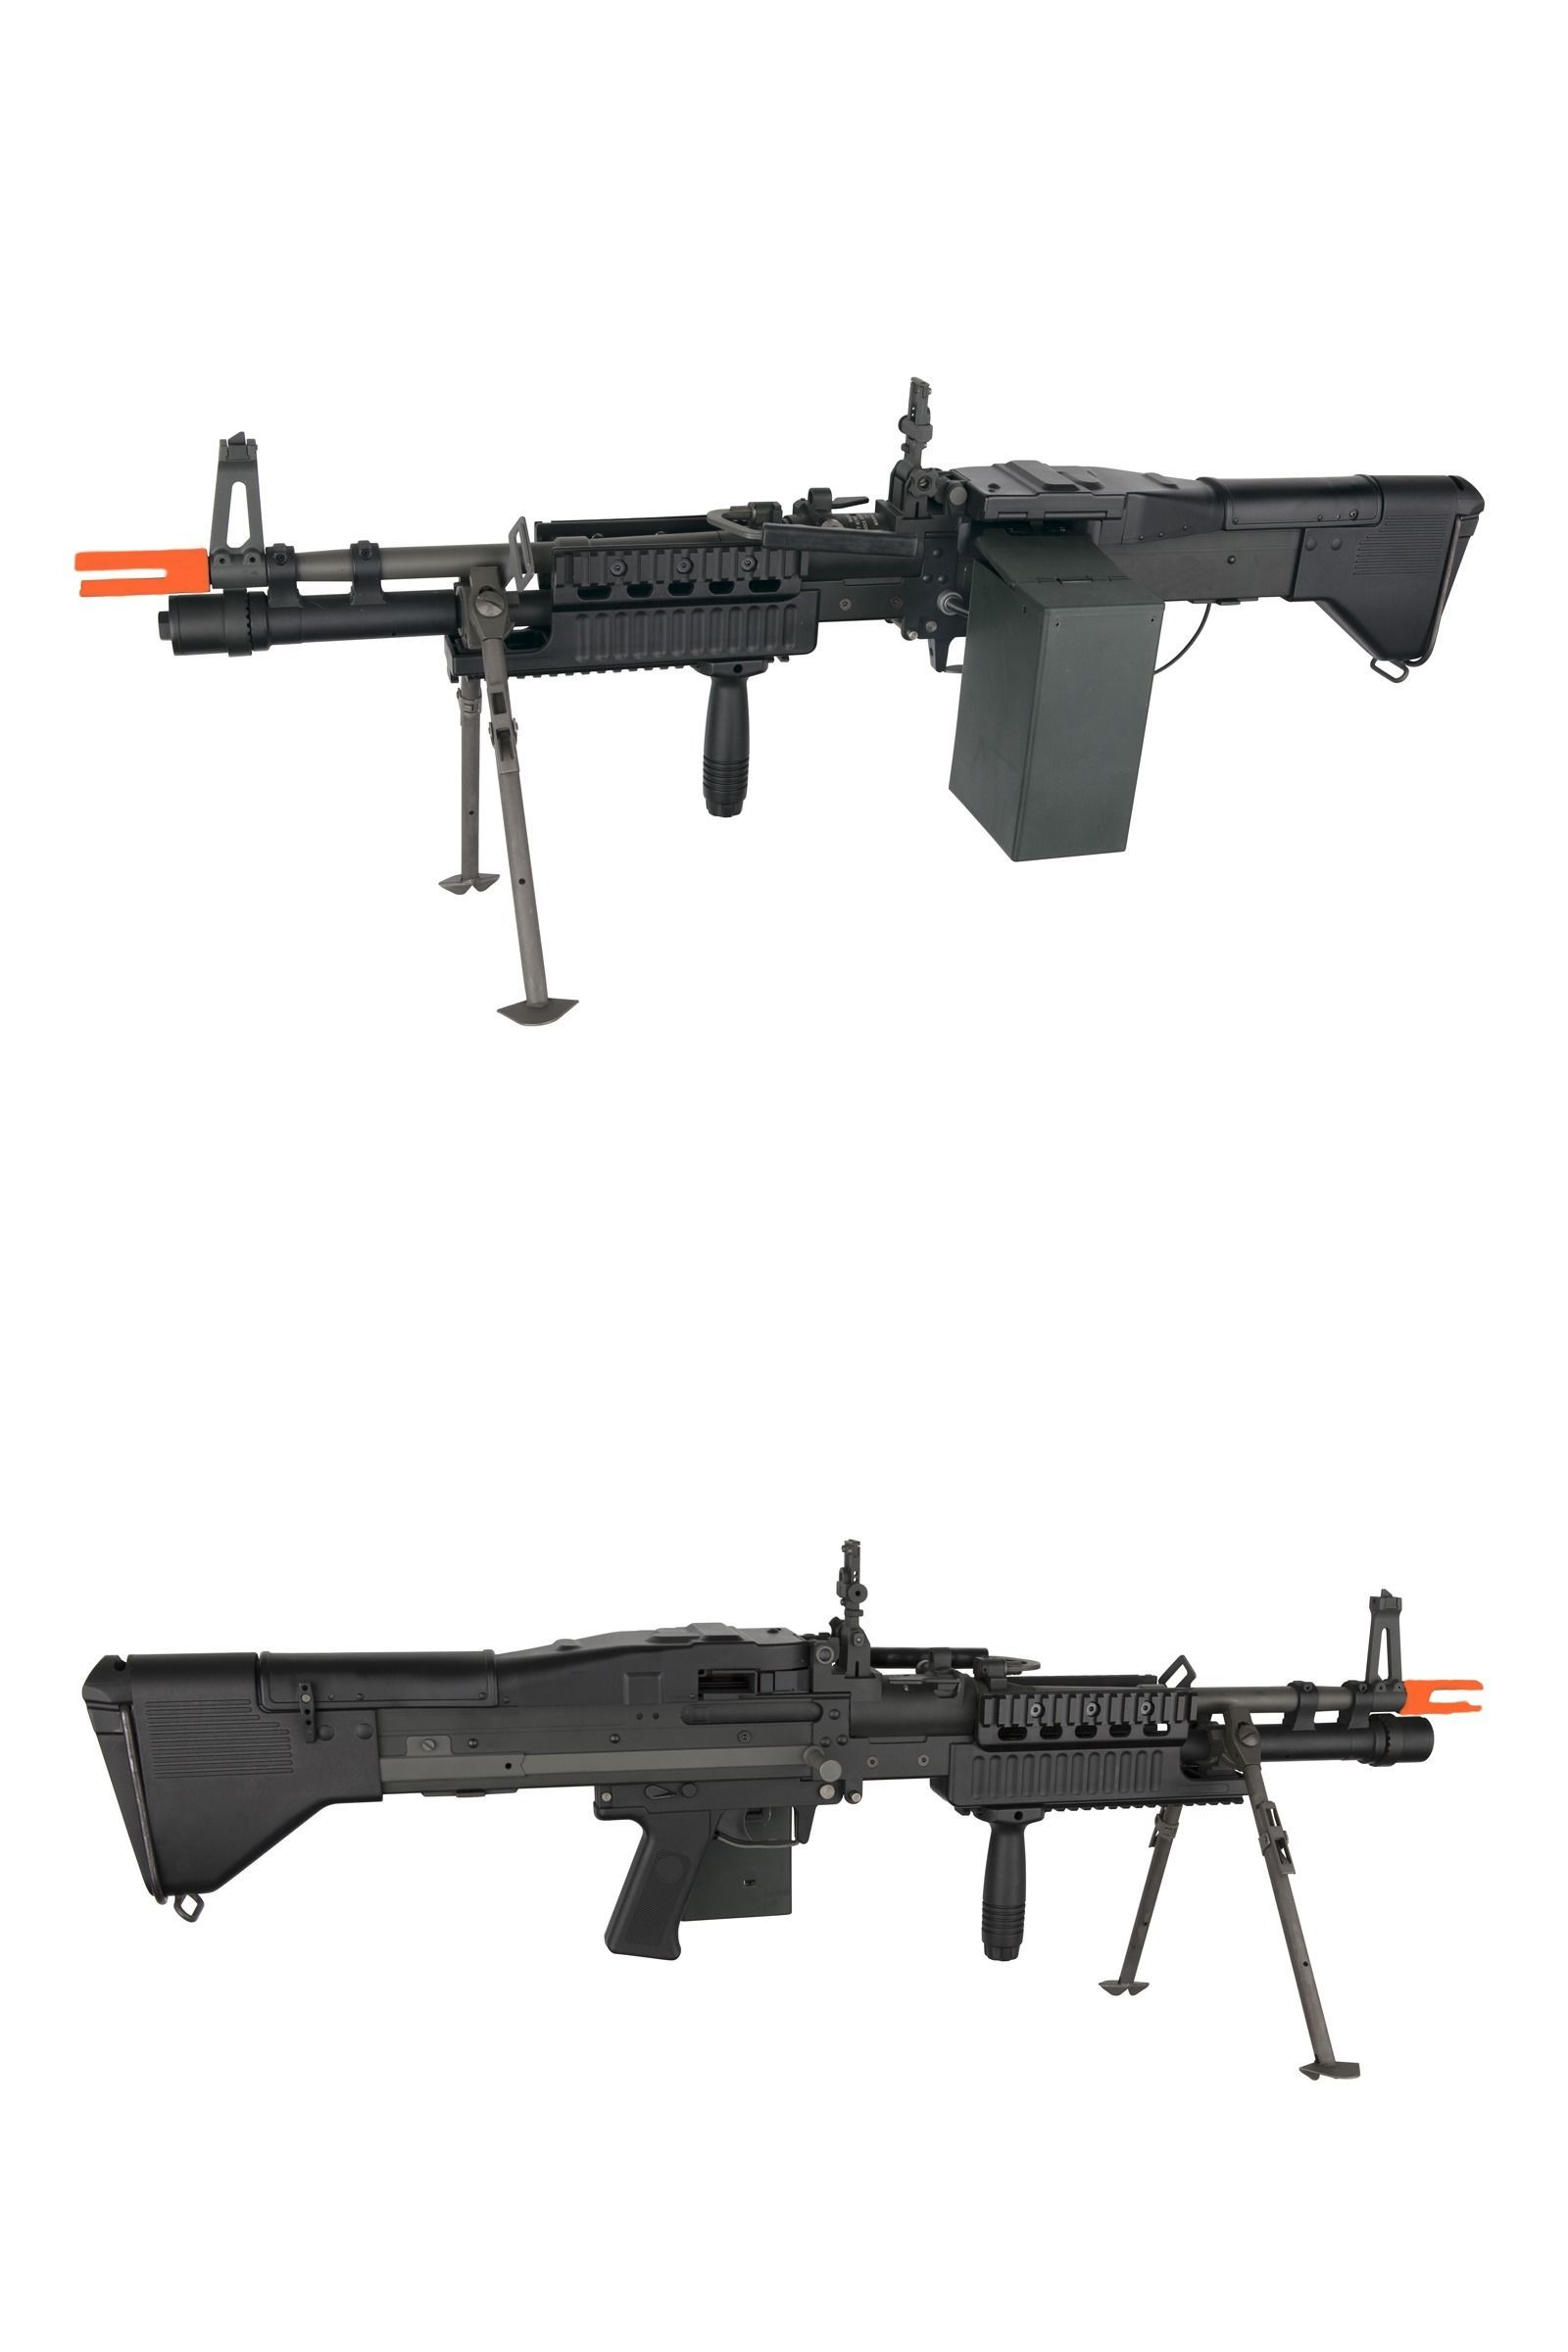 8403173c4600 Rifle 160919: Asg Airsoft U.S. Ordnance M60e4 Mk43 Commando Machine Gun  Metal M60 Aeg Rifle -> BUY IT NOW ONLY: $389.95 on eBay!